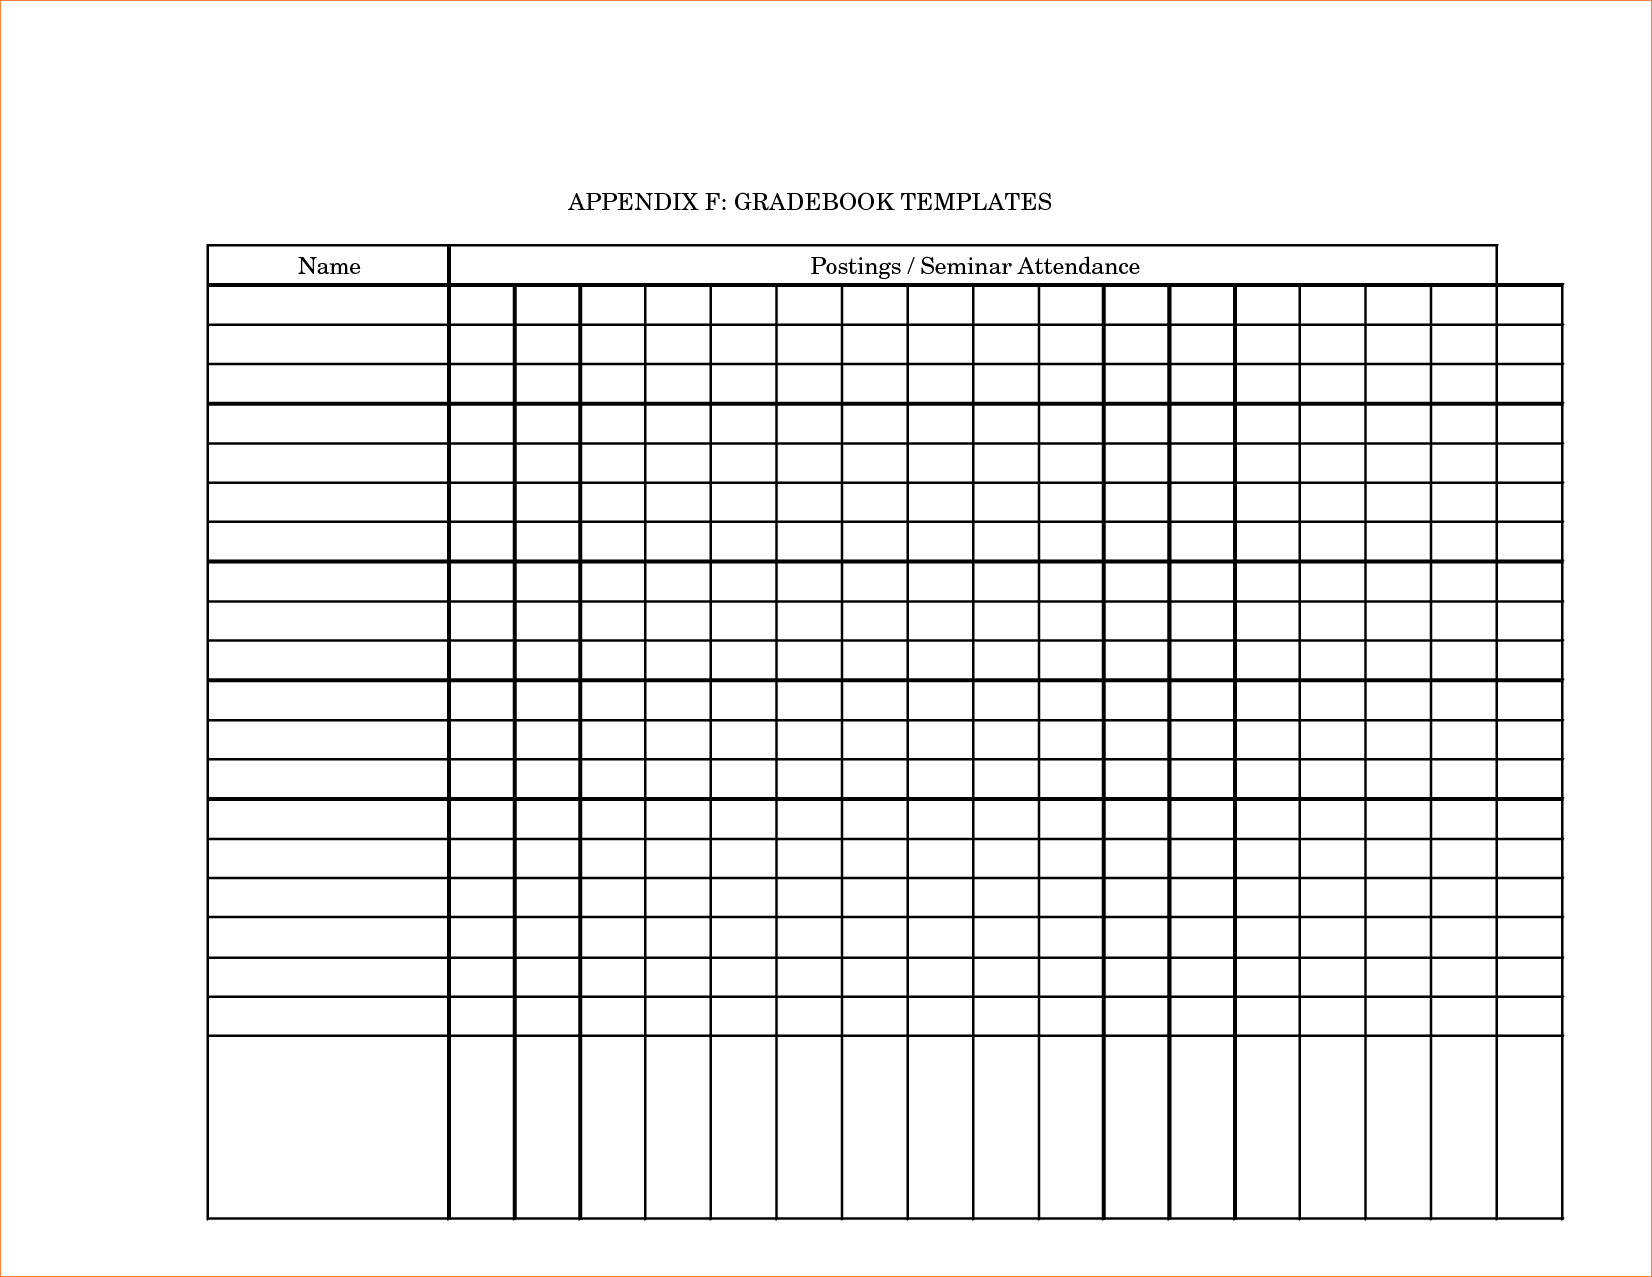 Printable Grade Book Template For Teachers - Southbay Robot and Teacher Printable Templates